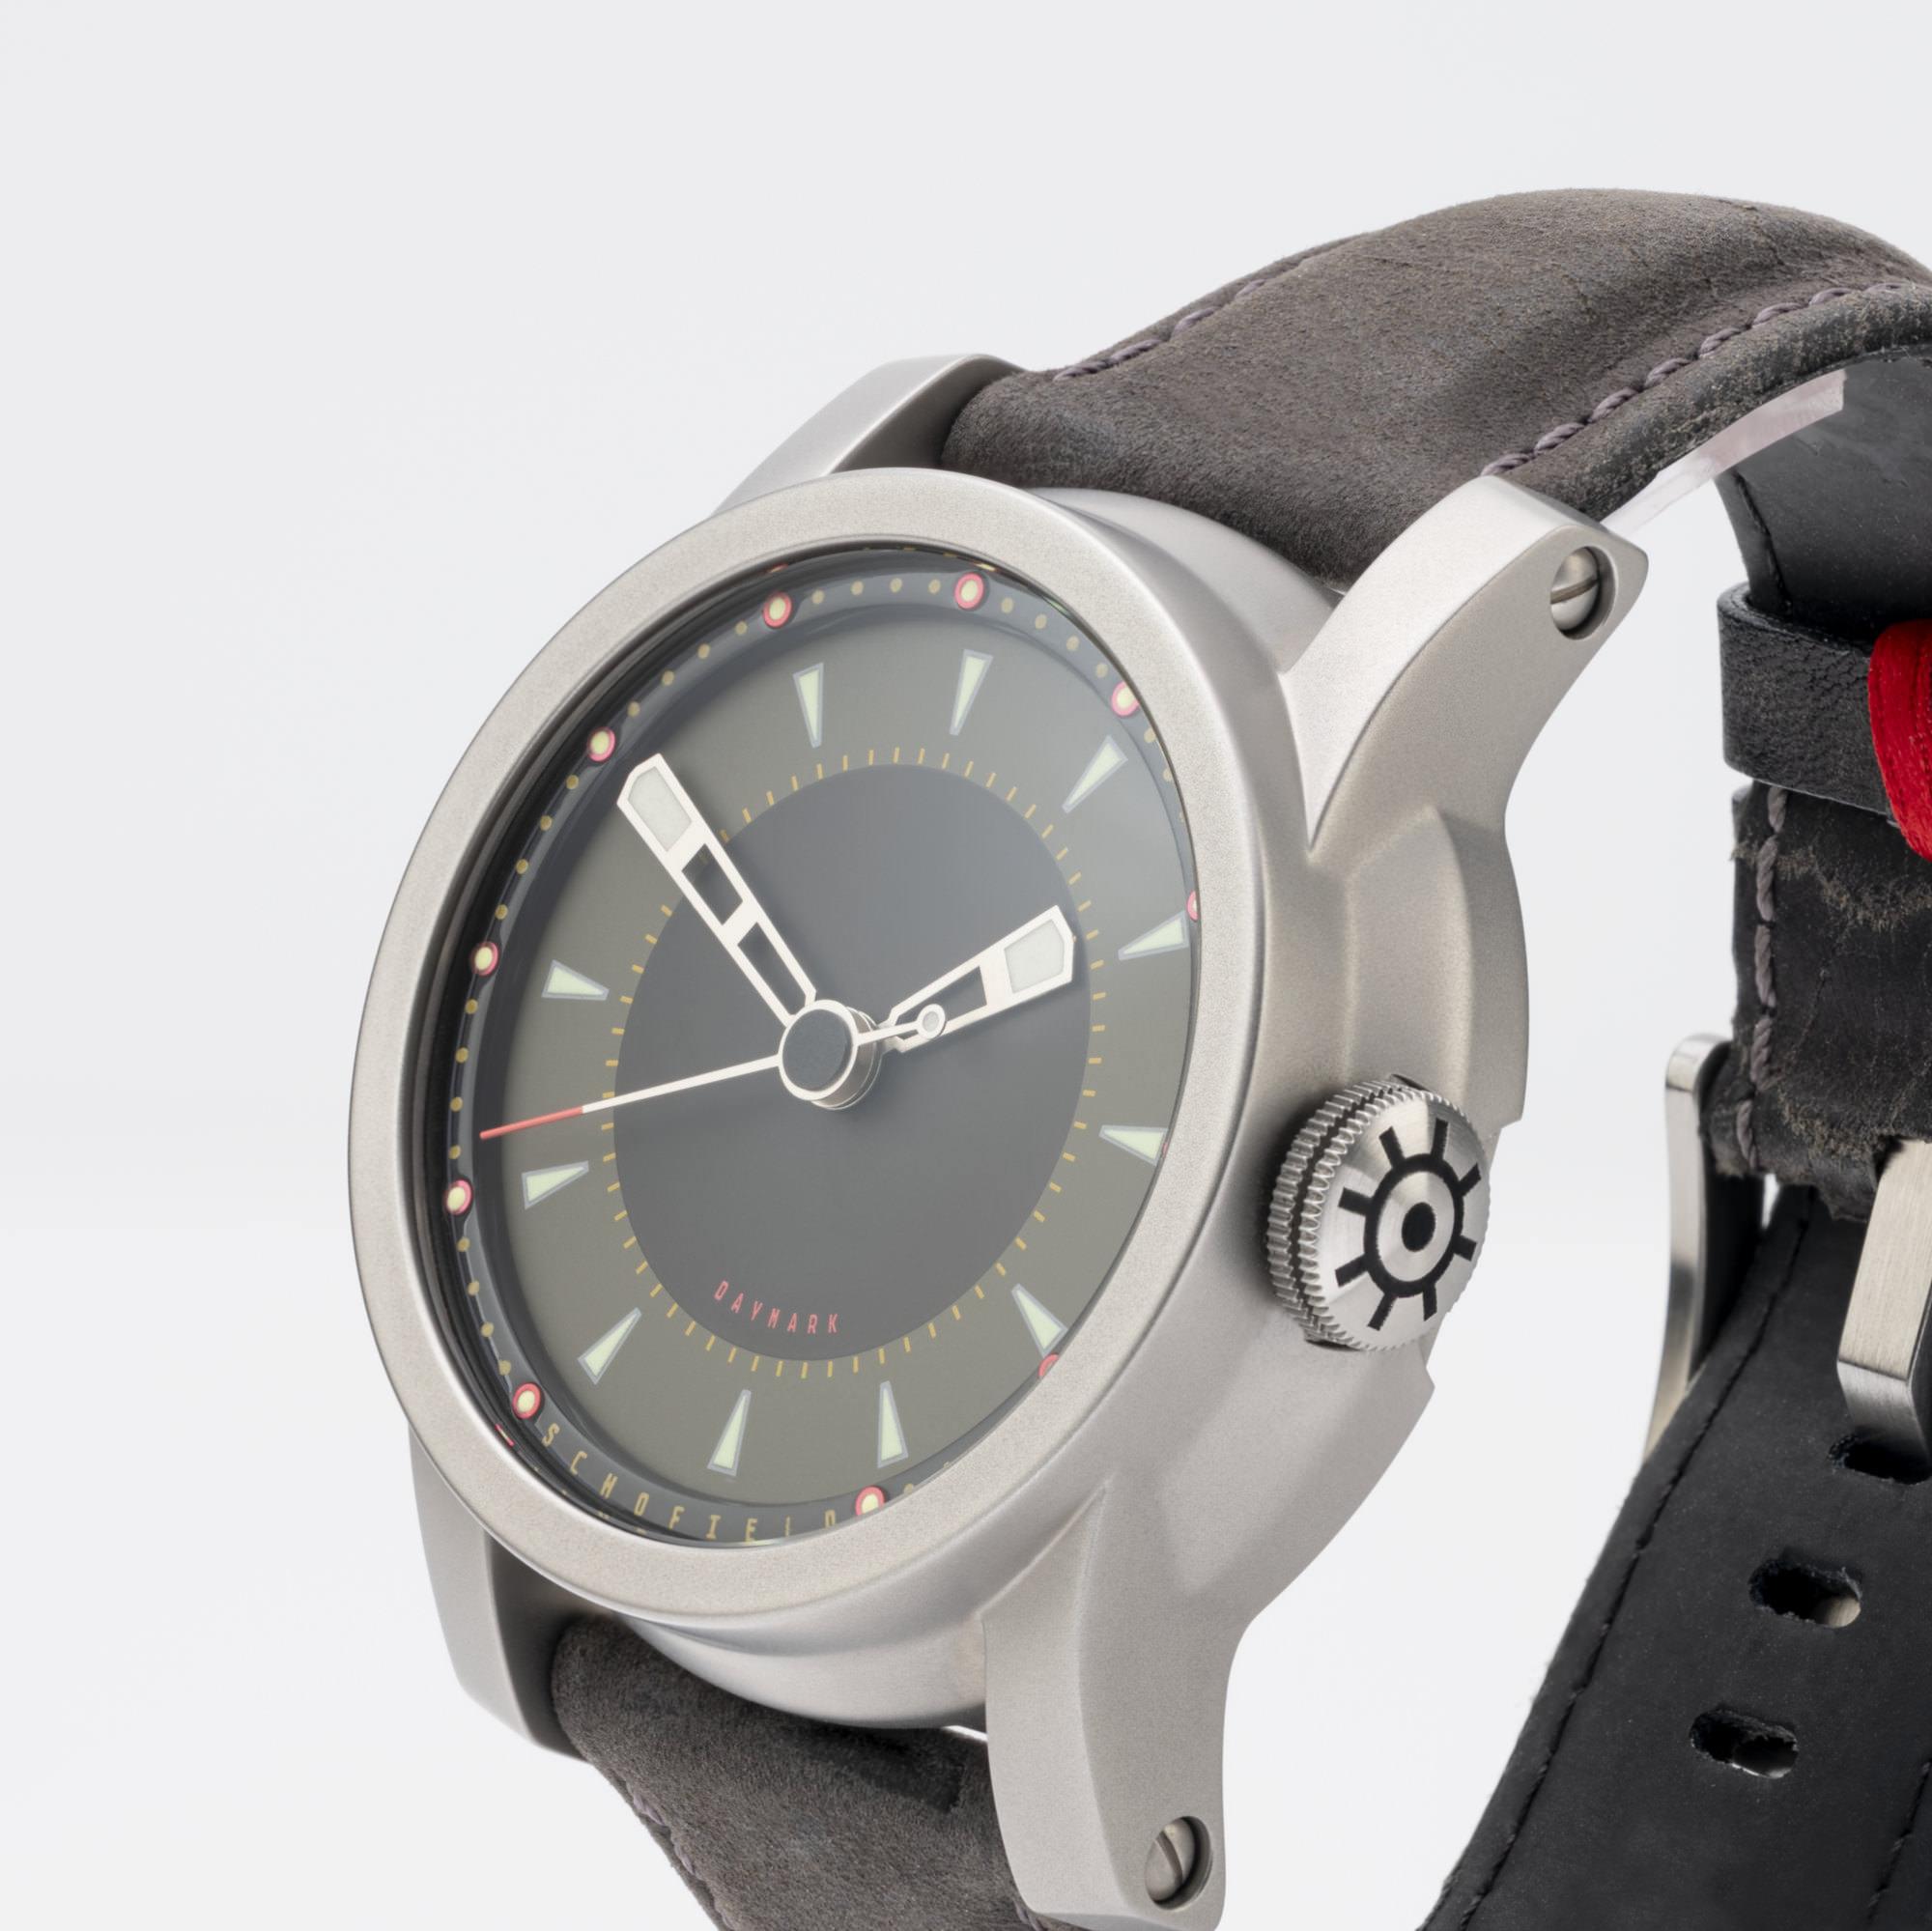 Schofield green dialled watches